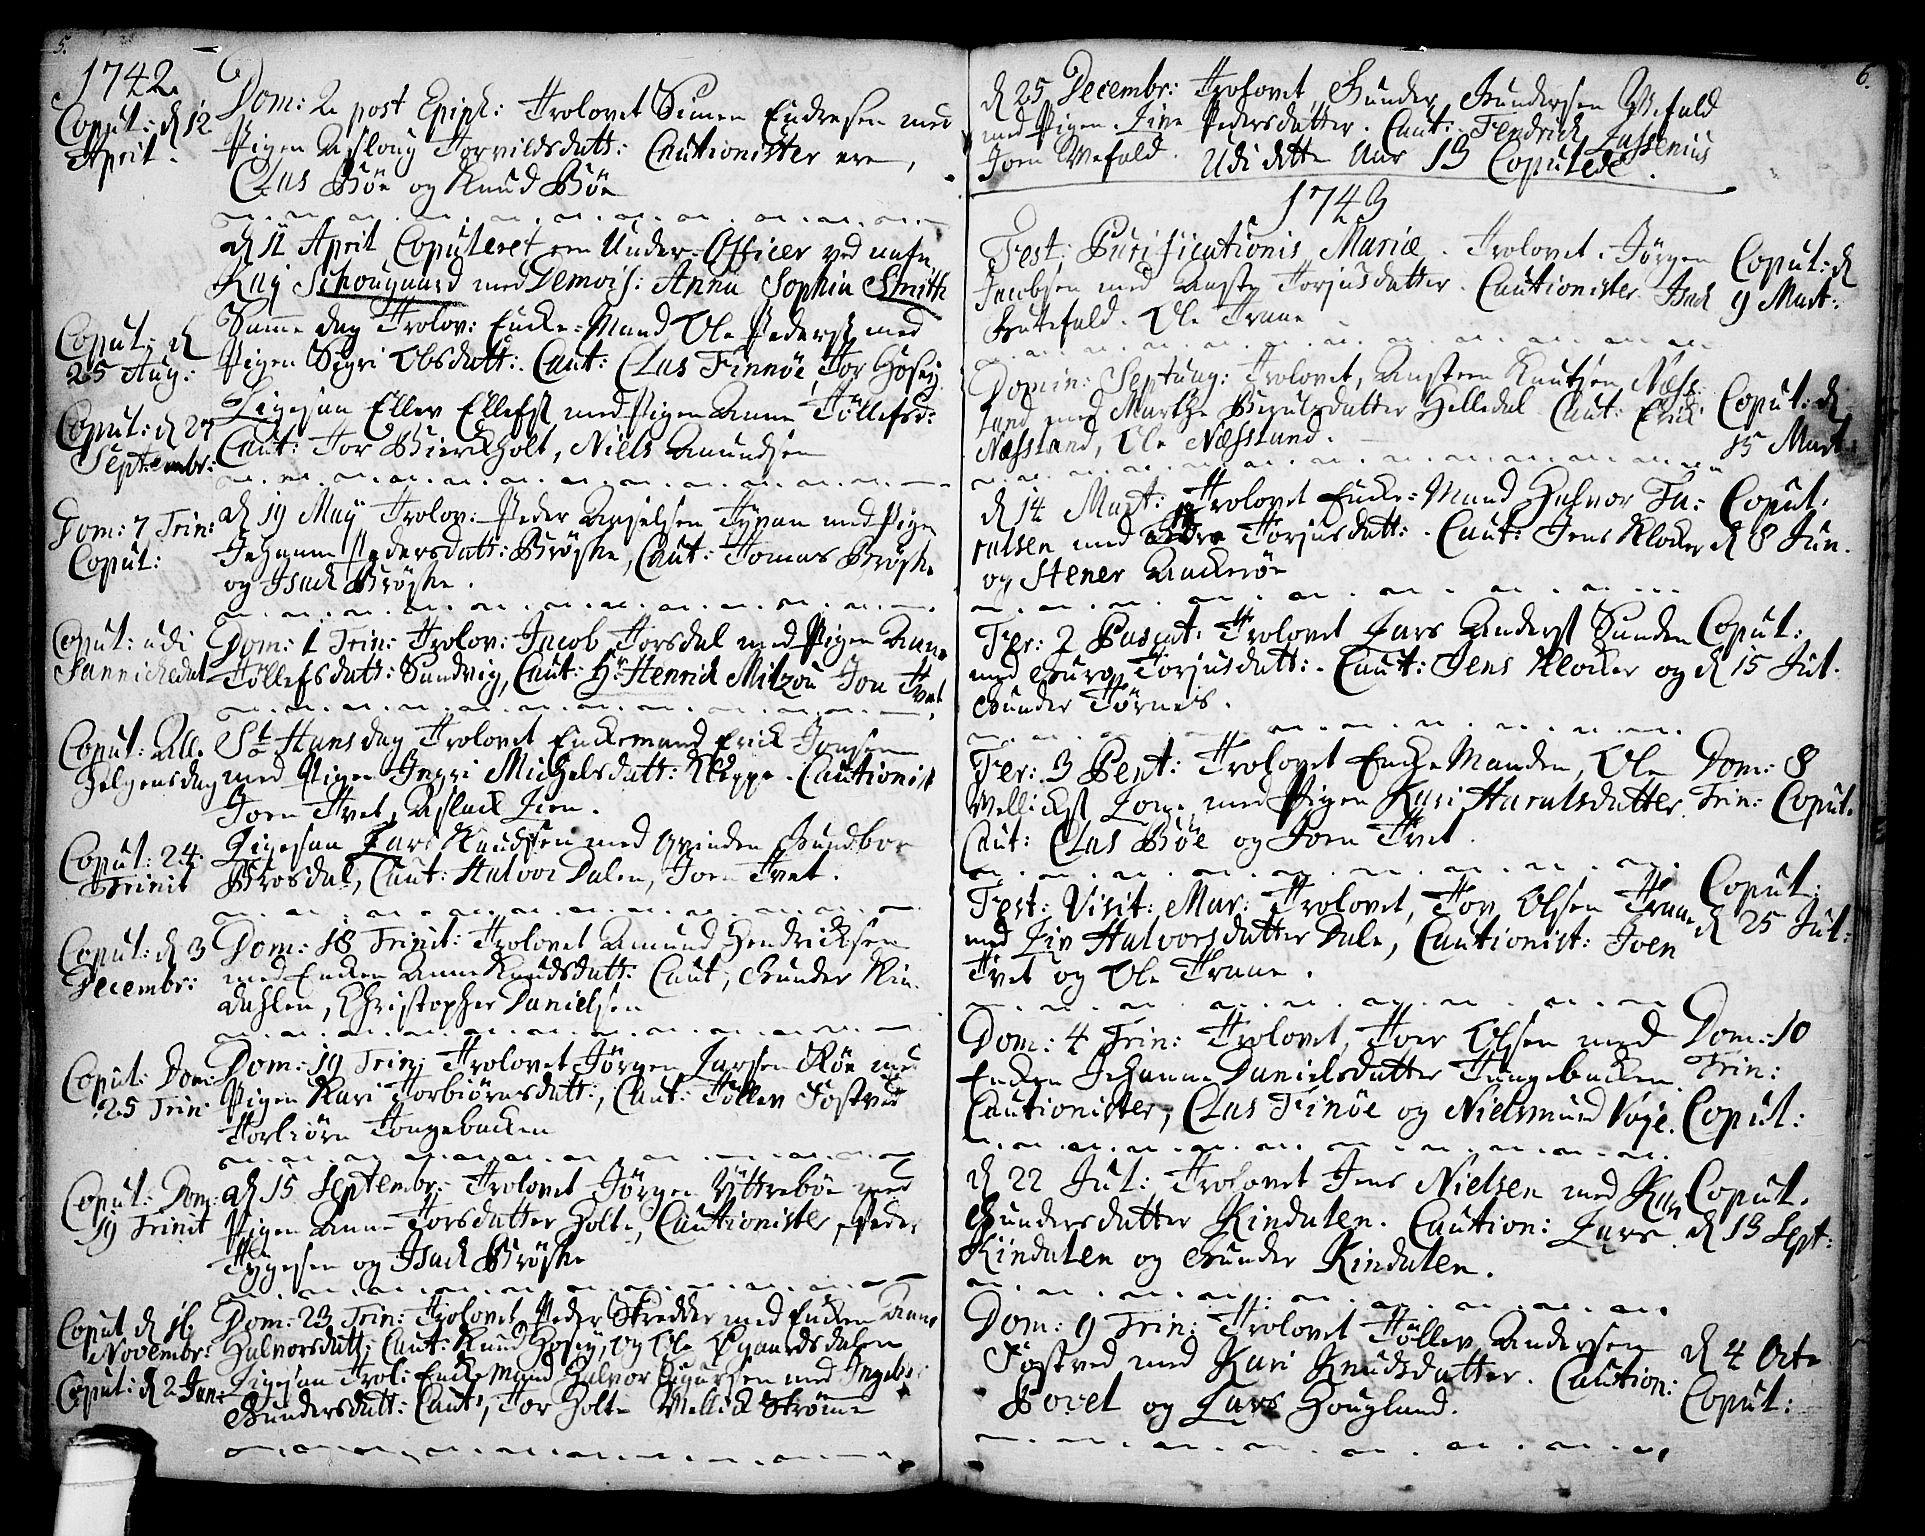 SAKO, Drangedal kirkebøker, F/Fa/L0001: Ministerialbok nr. 1, 1697-1767, s. 5-6